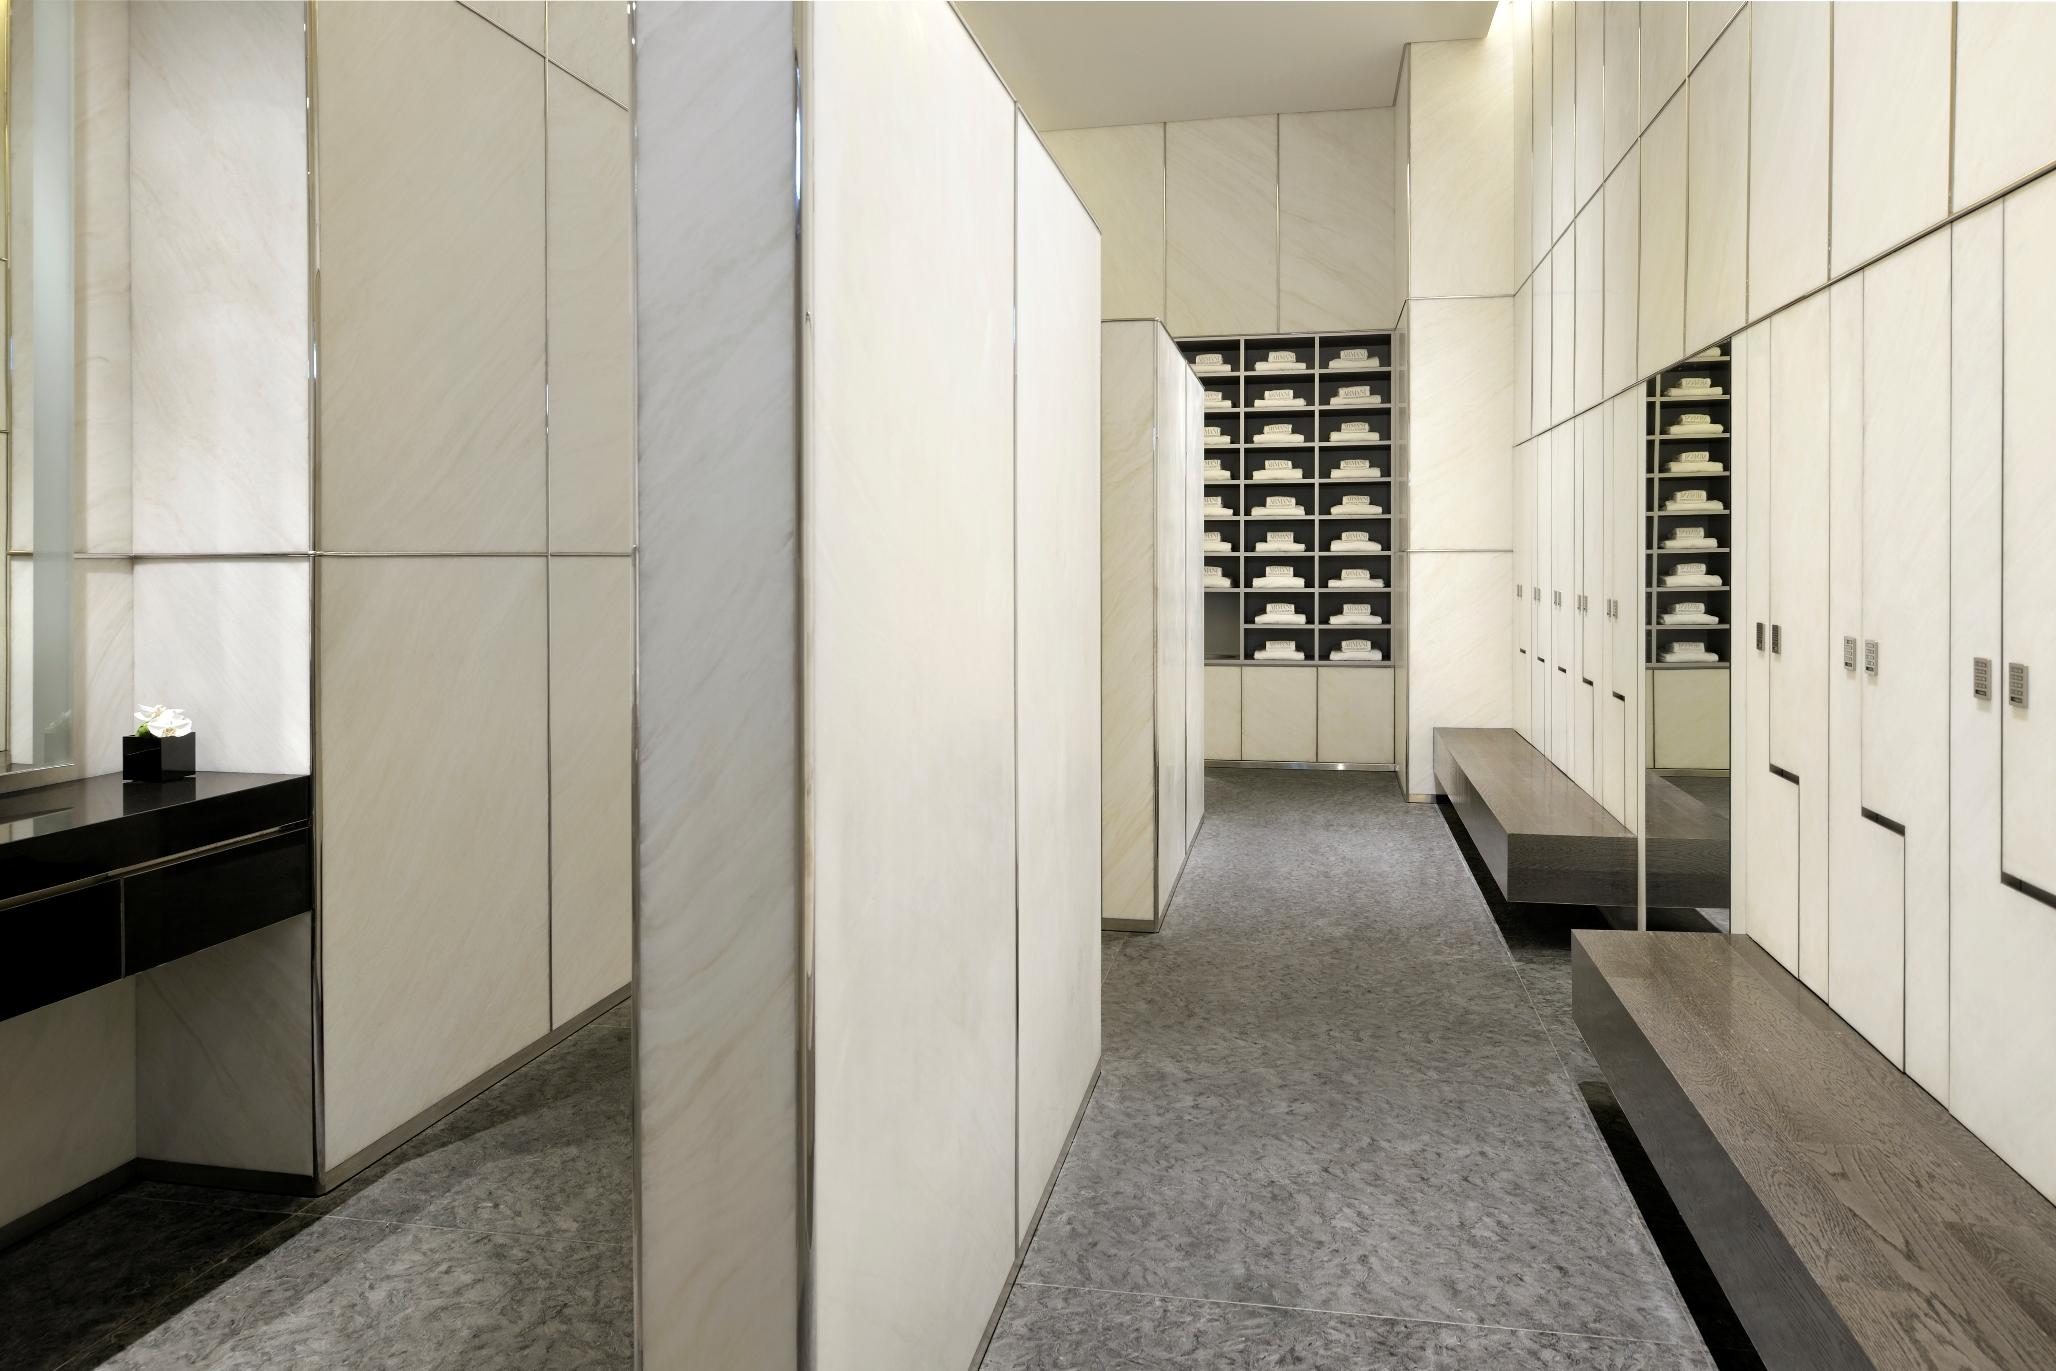 Armani Spa - Changing Room2